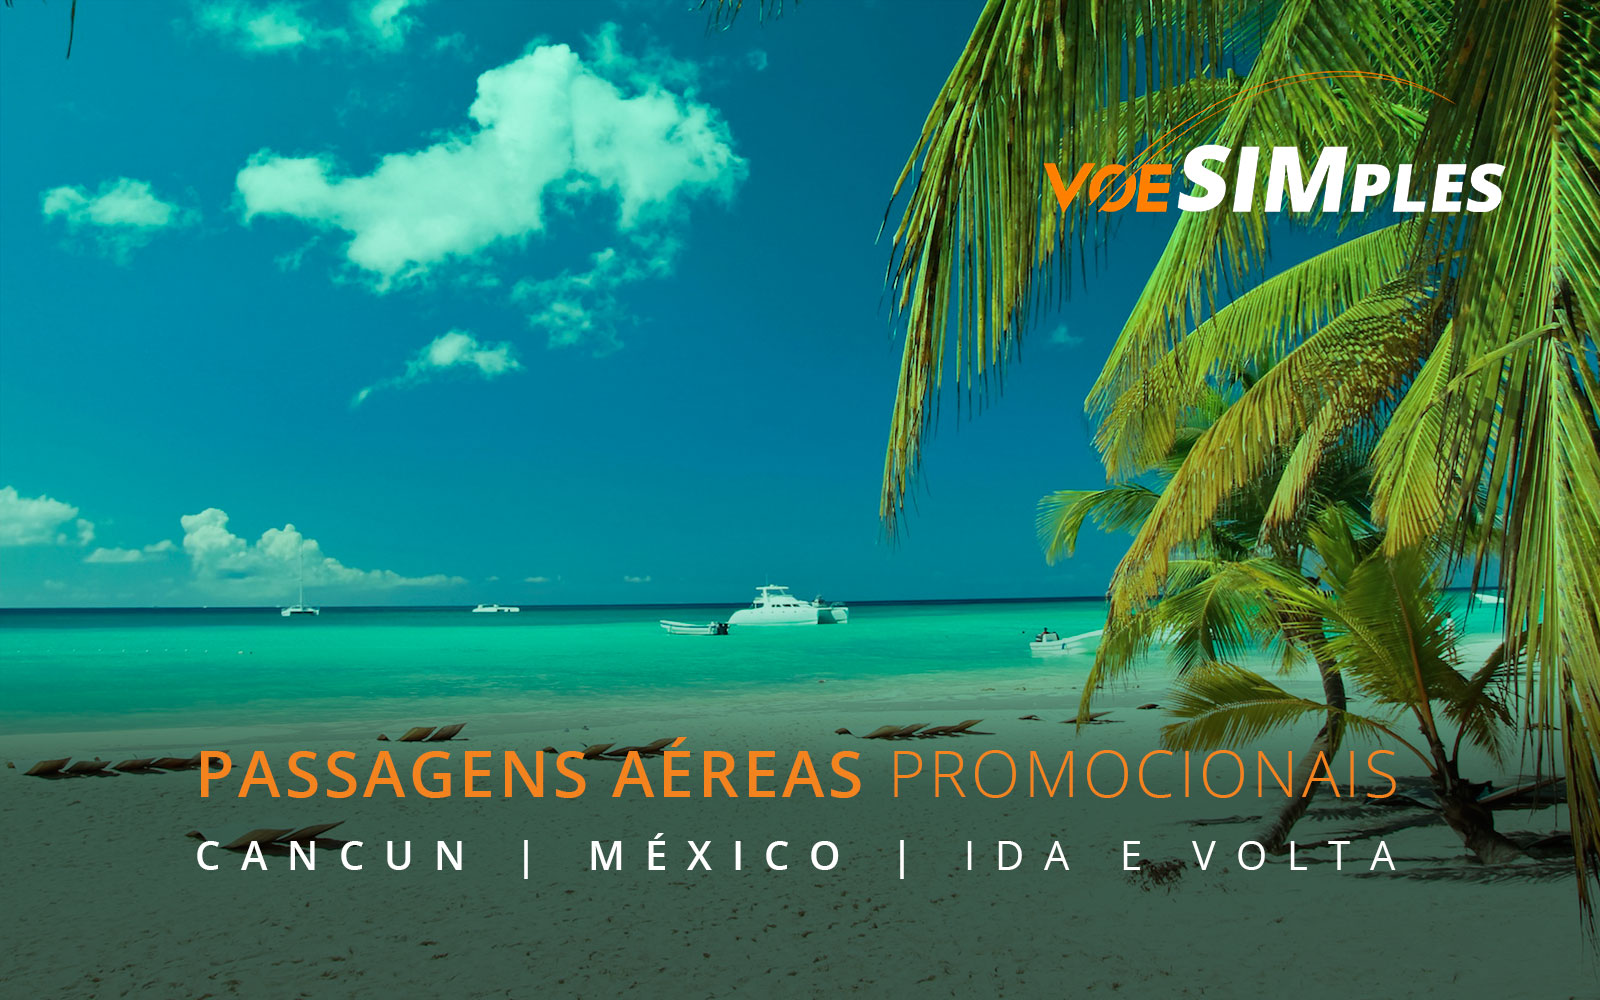 Passagens aéreas promocionais para Cancun no México